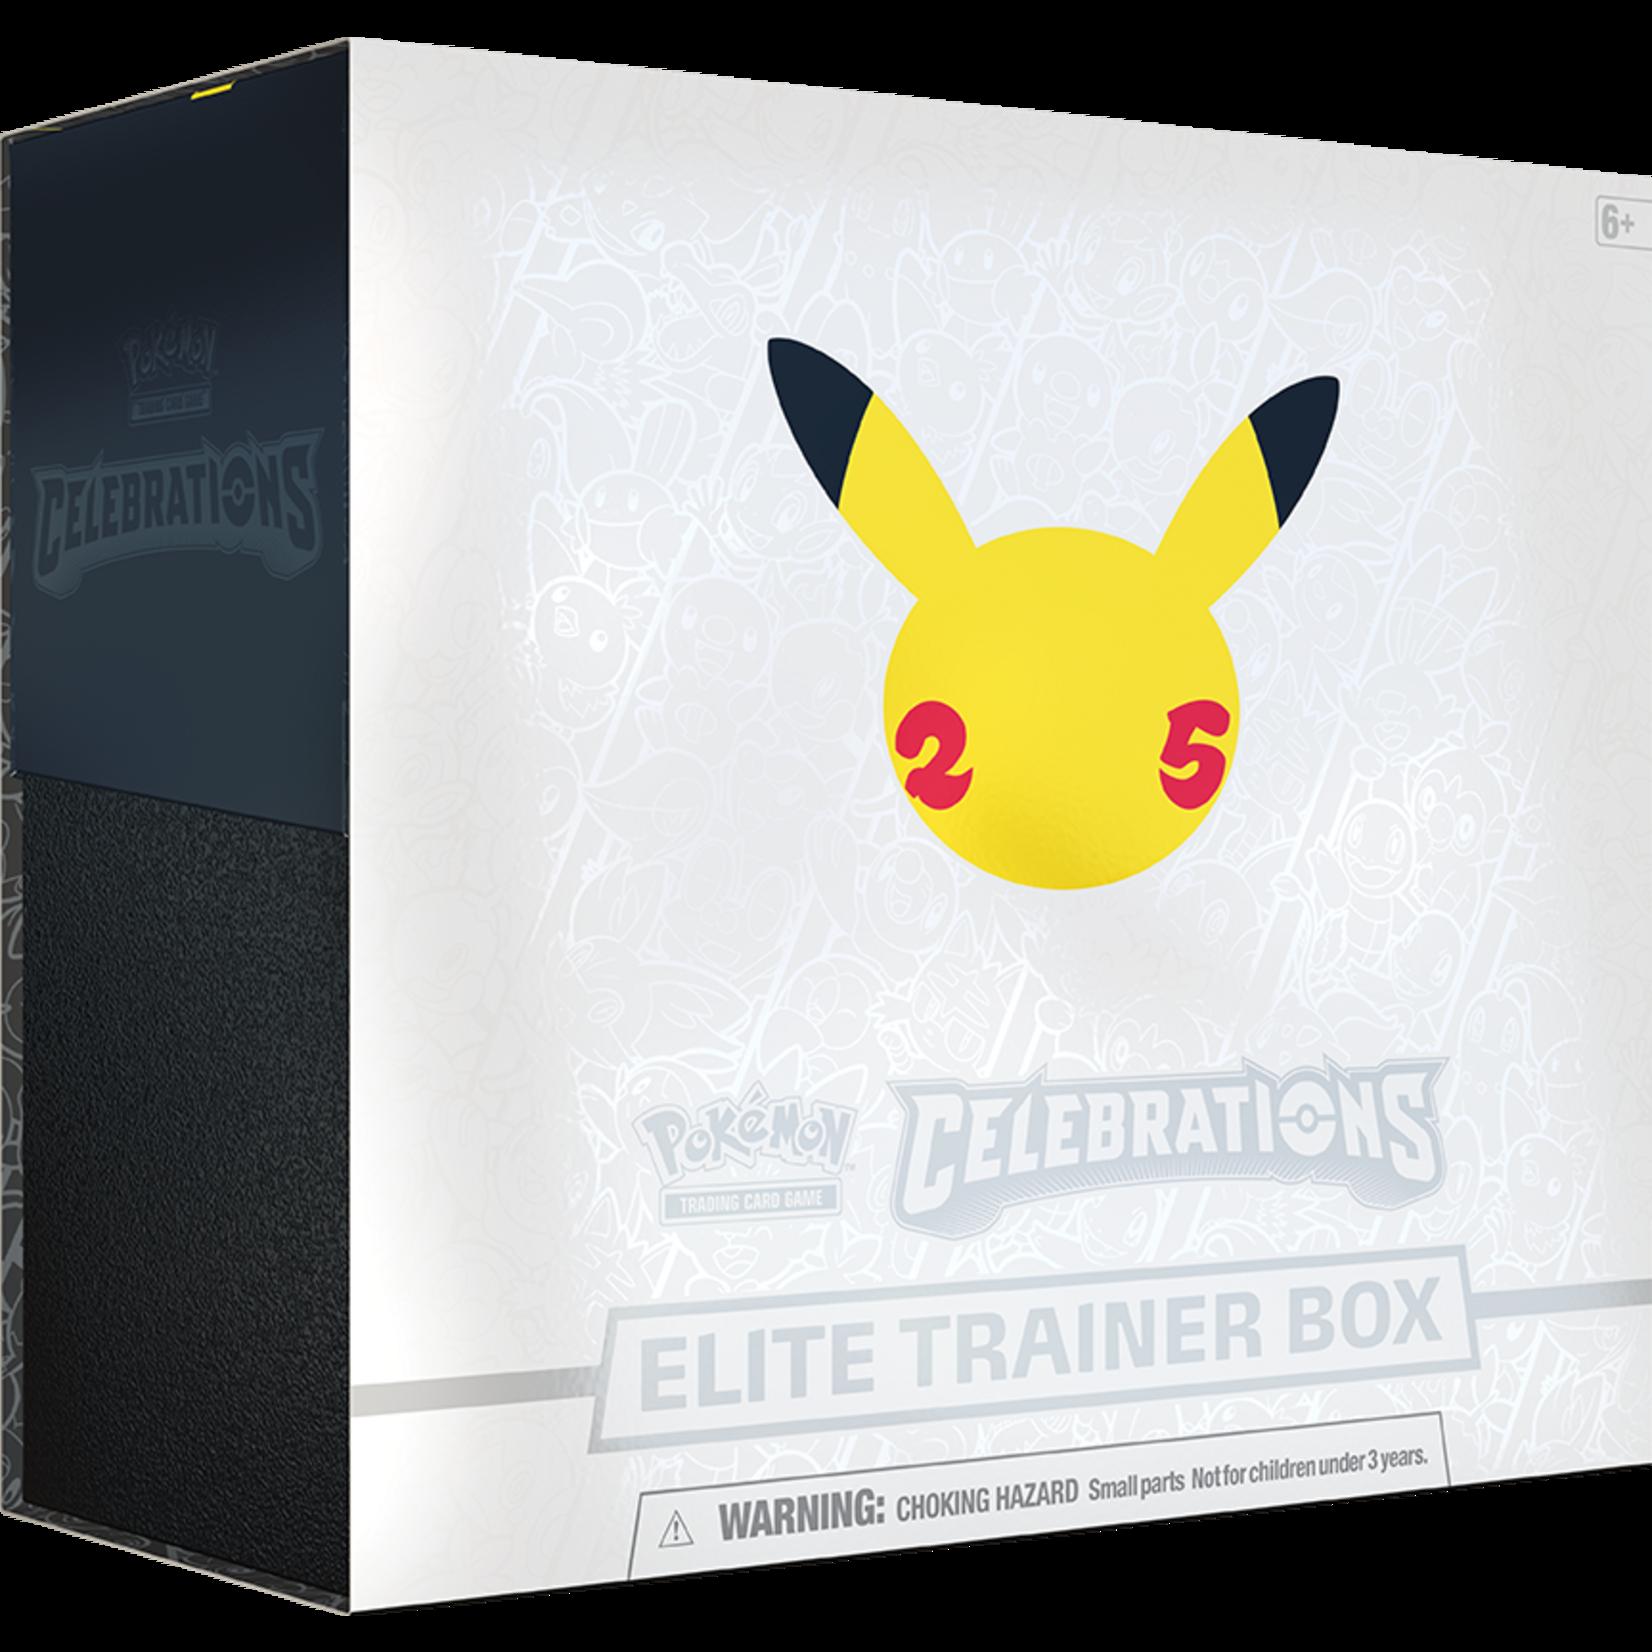 Pokémon Pokémon TCG: Celebrations Elite Trainer Box